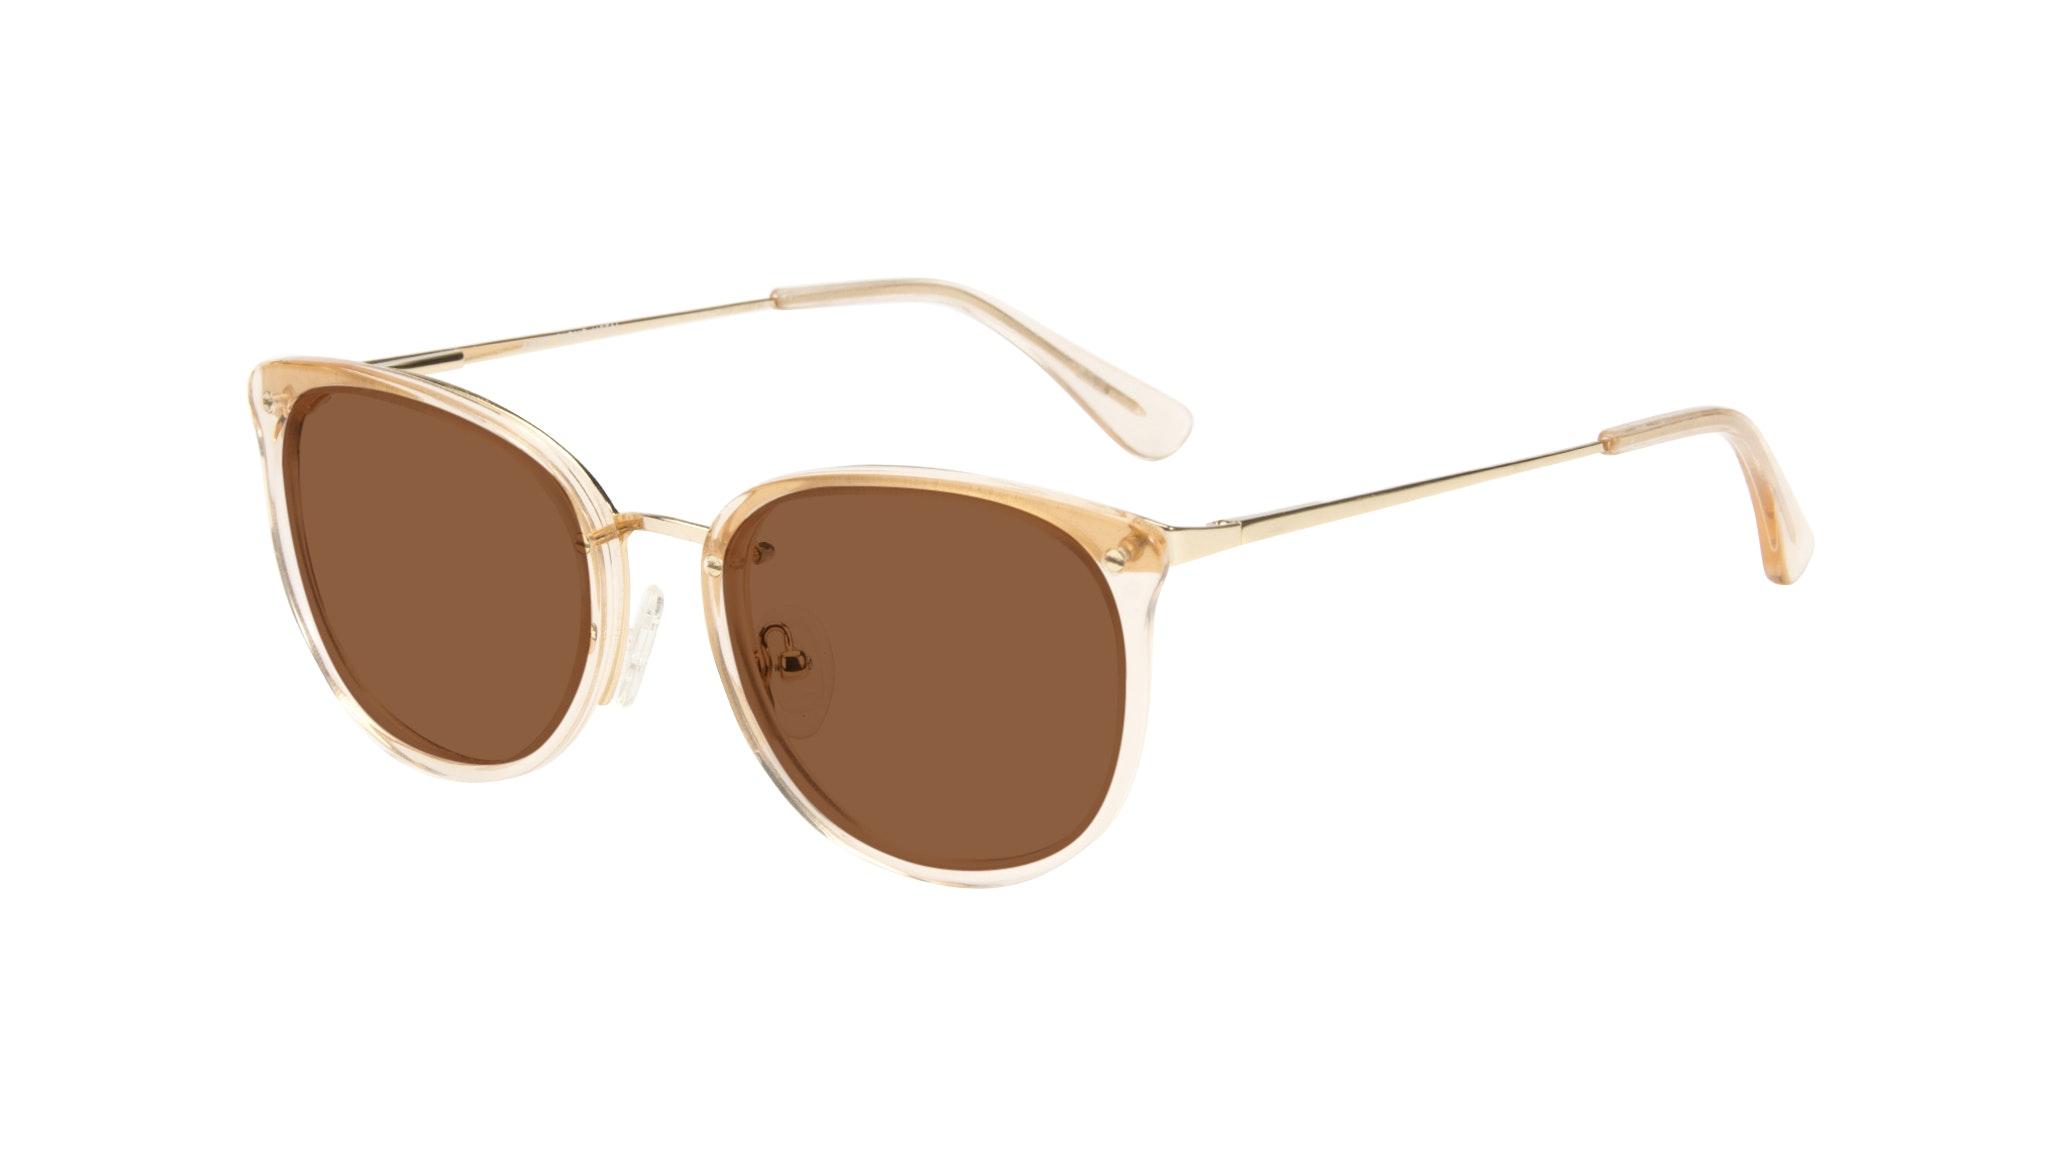 Affordable Fashion Glasses Square Round Sunglasses Women Amaze Blond Metal Tilt